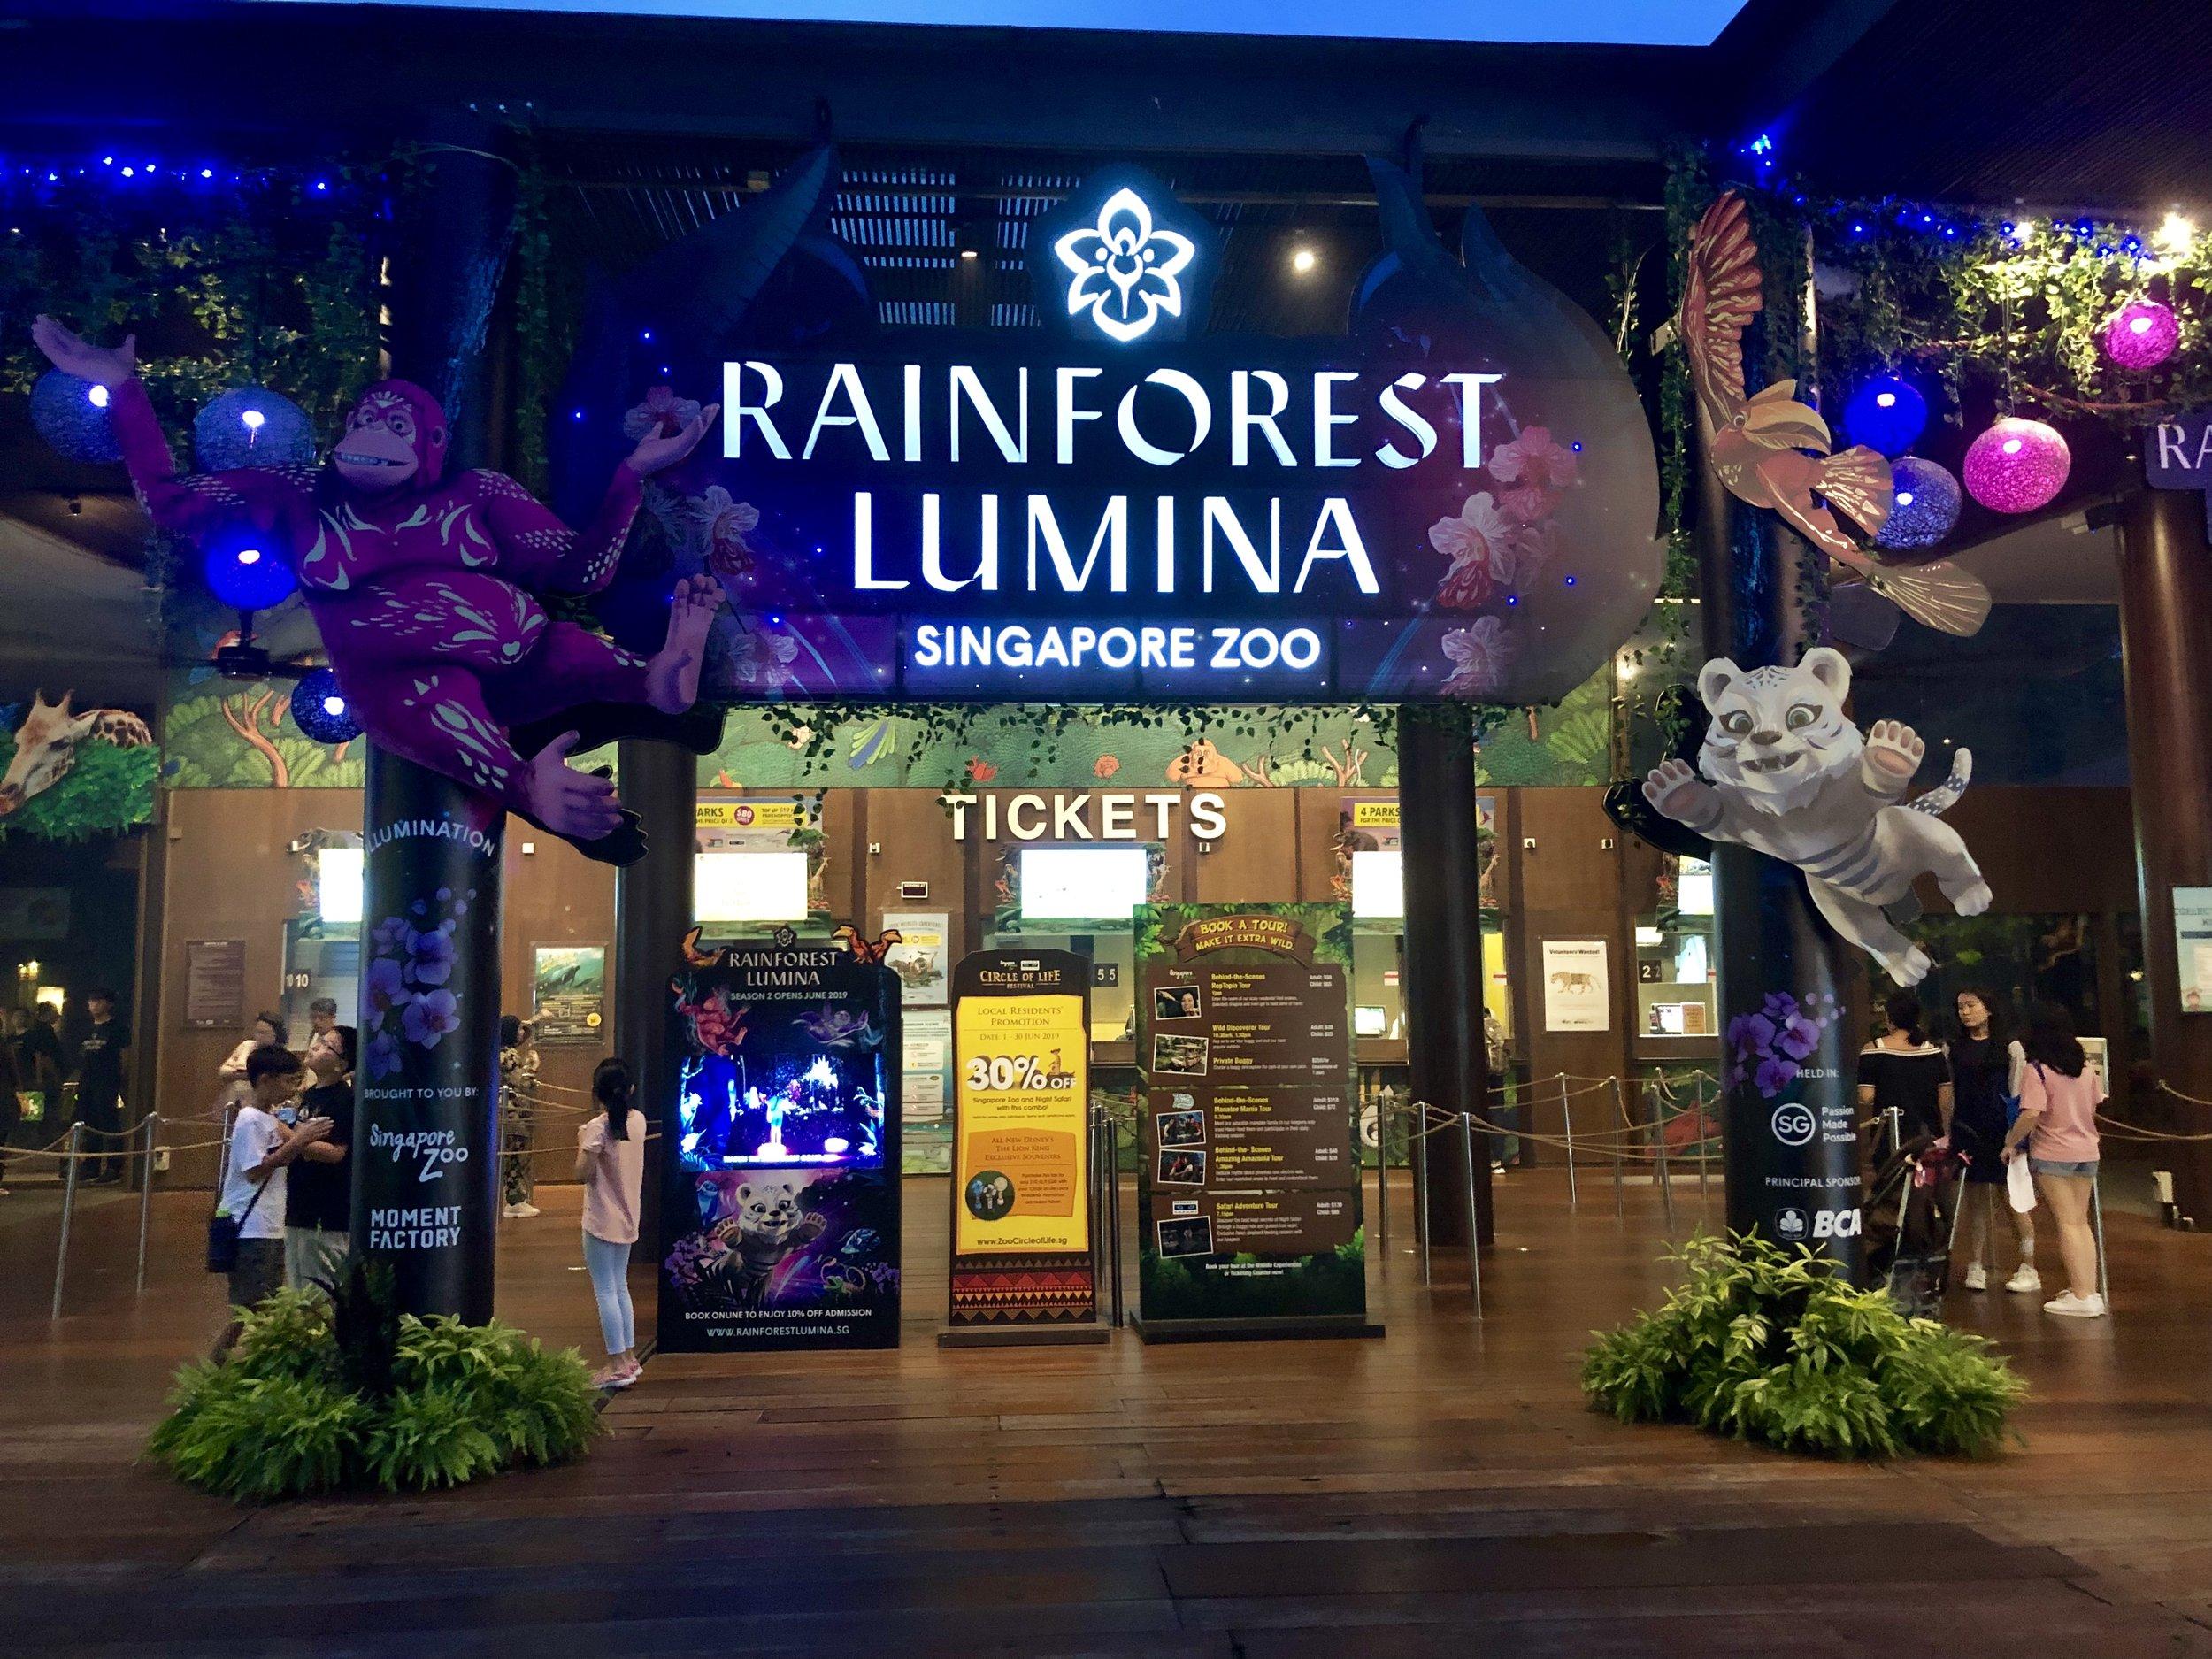 Singapore Zoo Rainforest Lumina